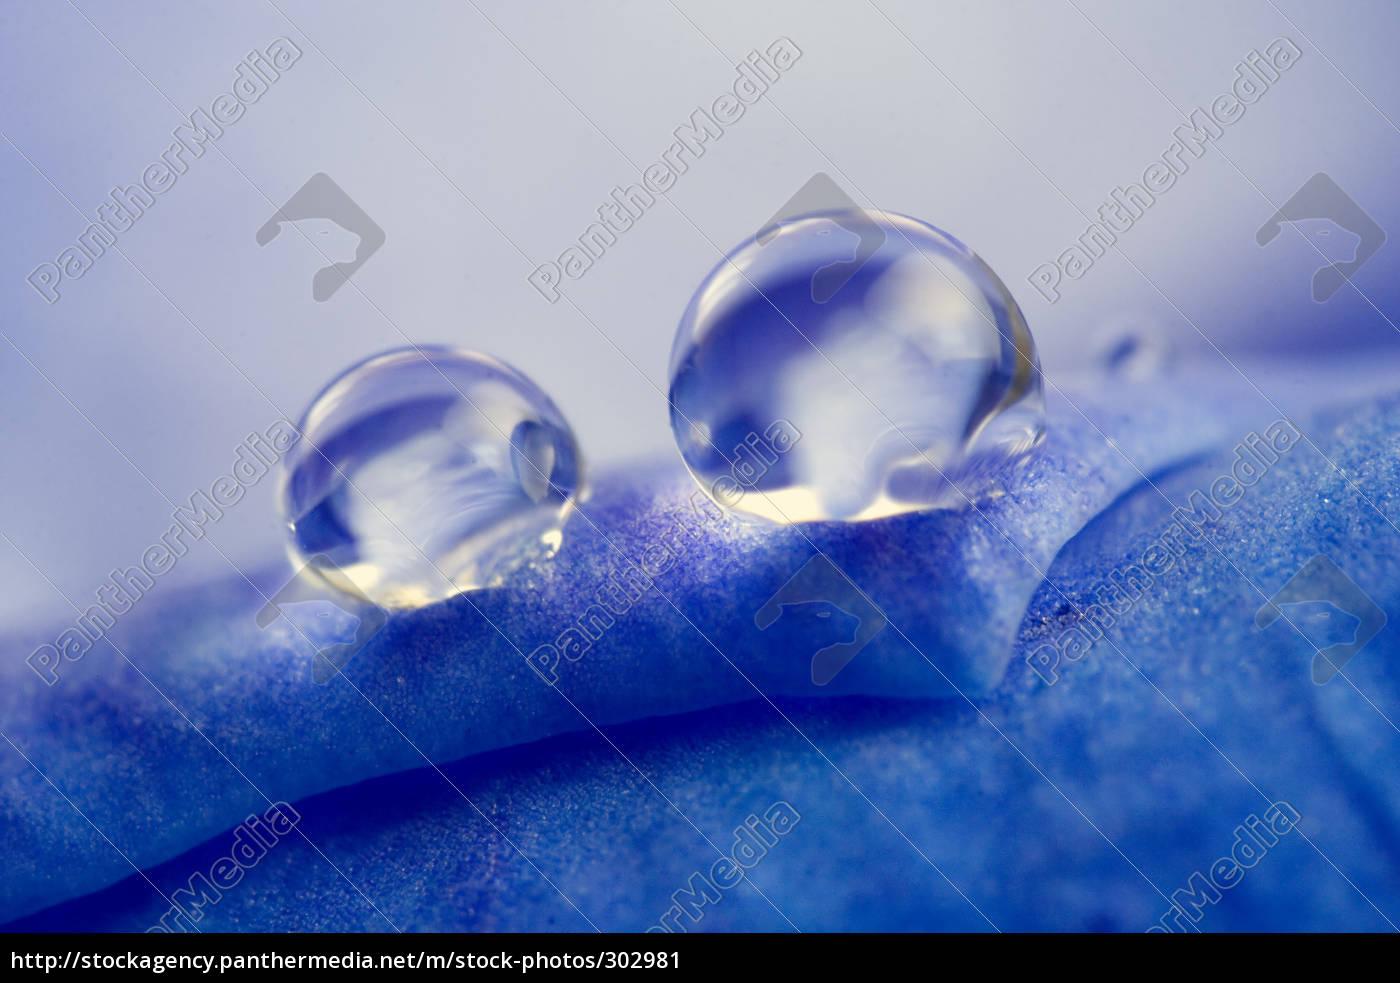 water, drops - 302981